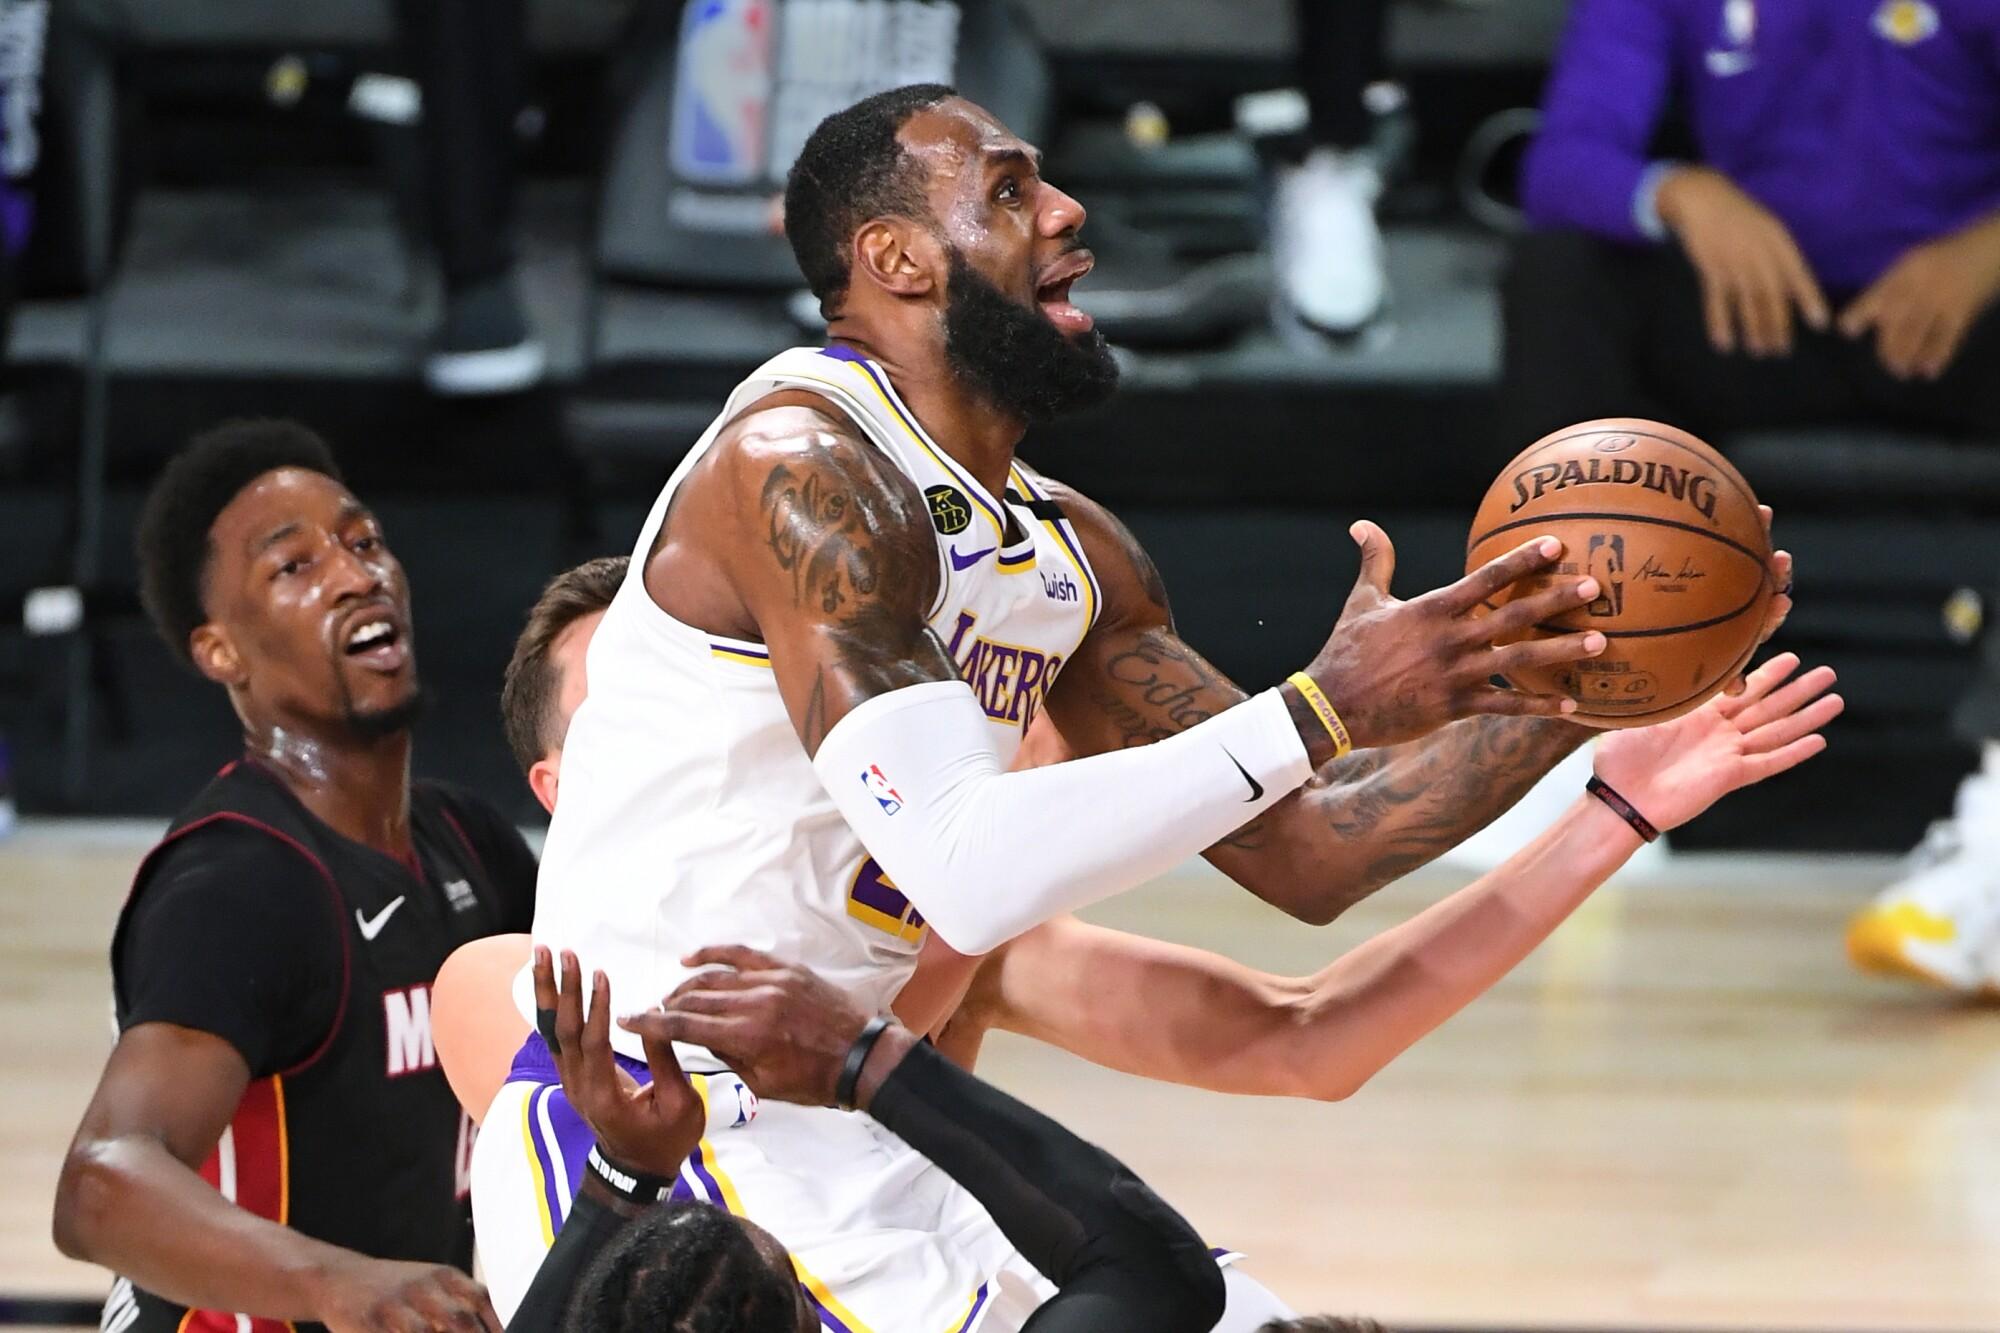 Lakers LeBron James beats the Heat defense top score a basket